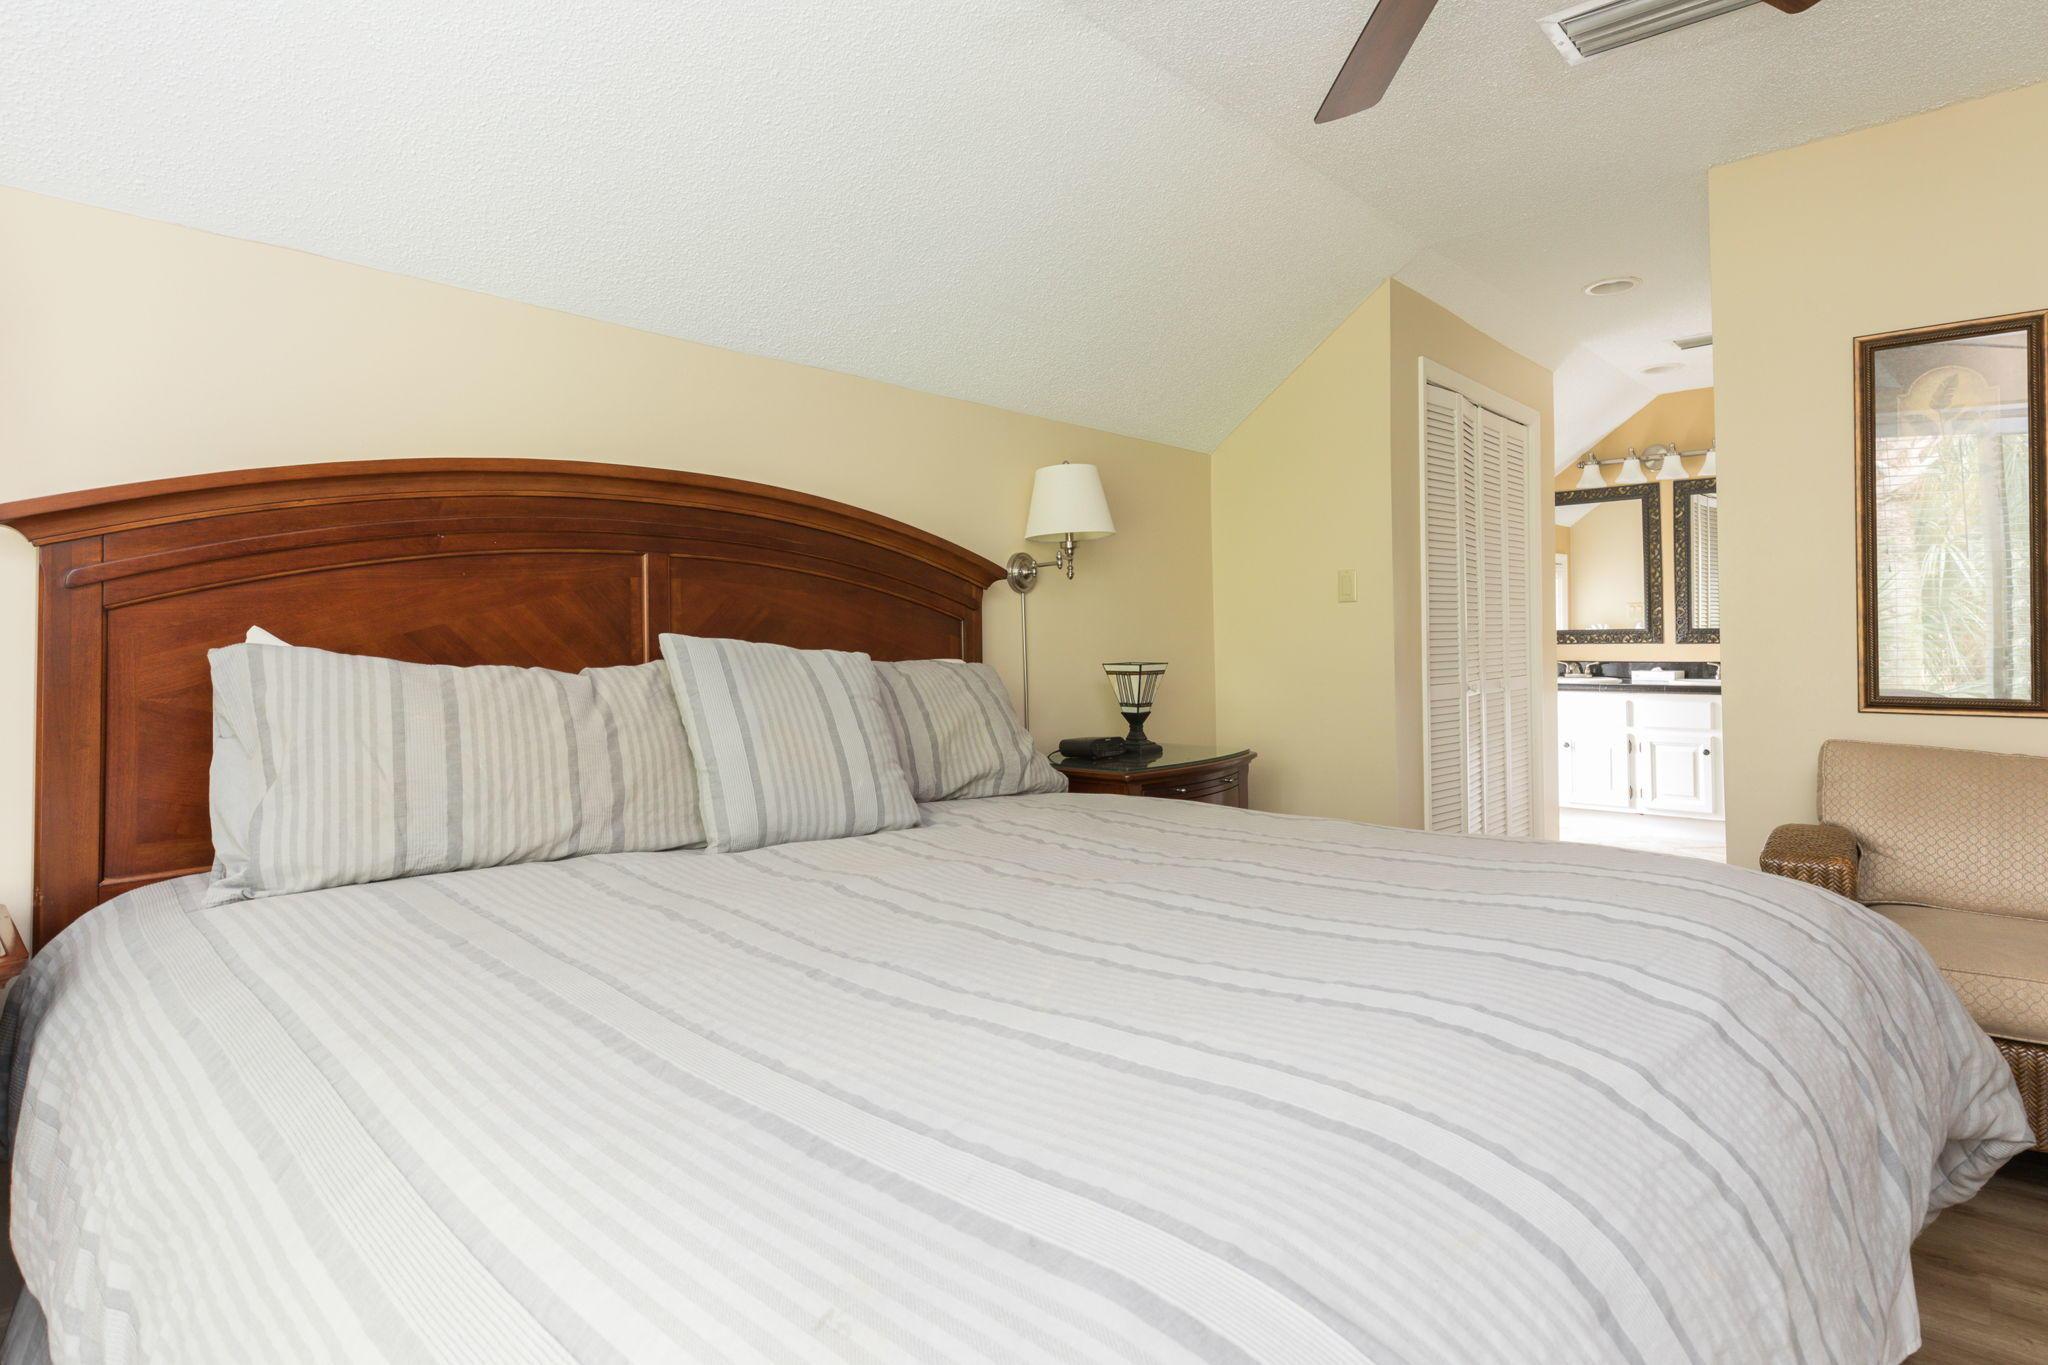 Kiawah Island Homes For Sale - 5534 Green Dolphin, Kiawah Island, SC - 39